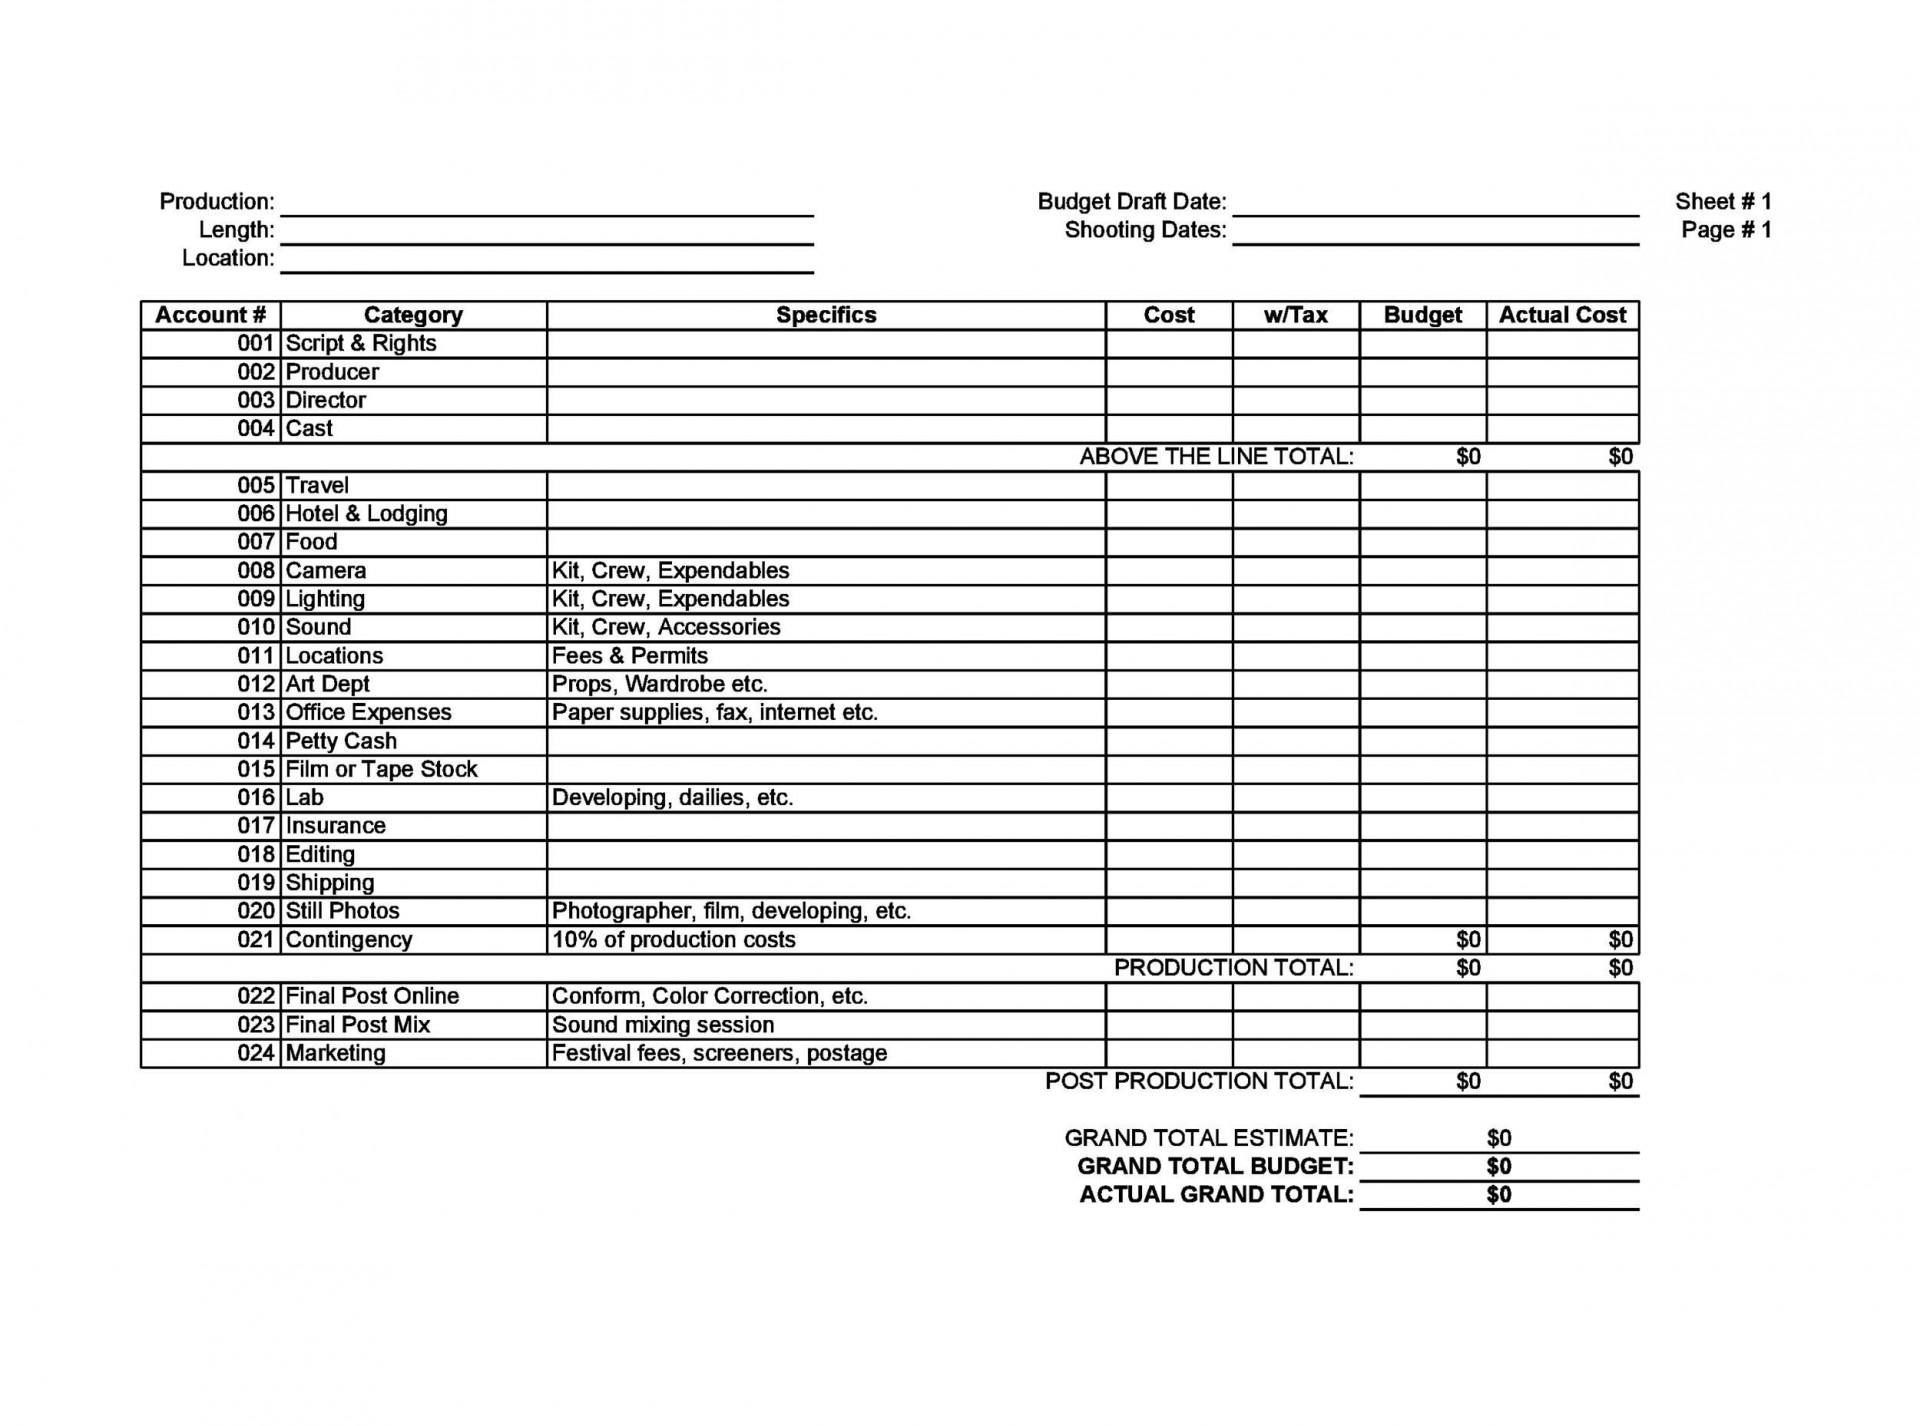 009 Stupendou Line Item Budget Sample Image  Church For Grant Proposal Format1920